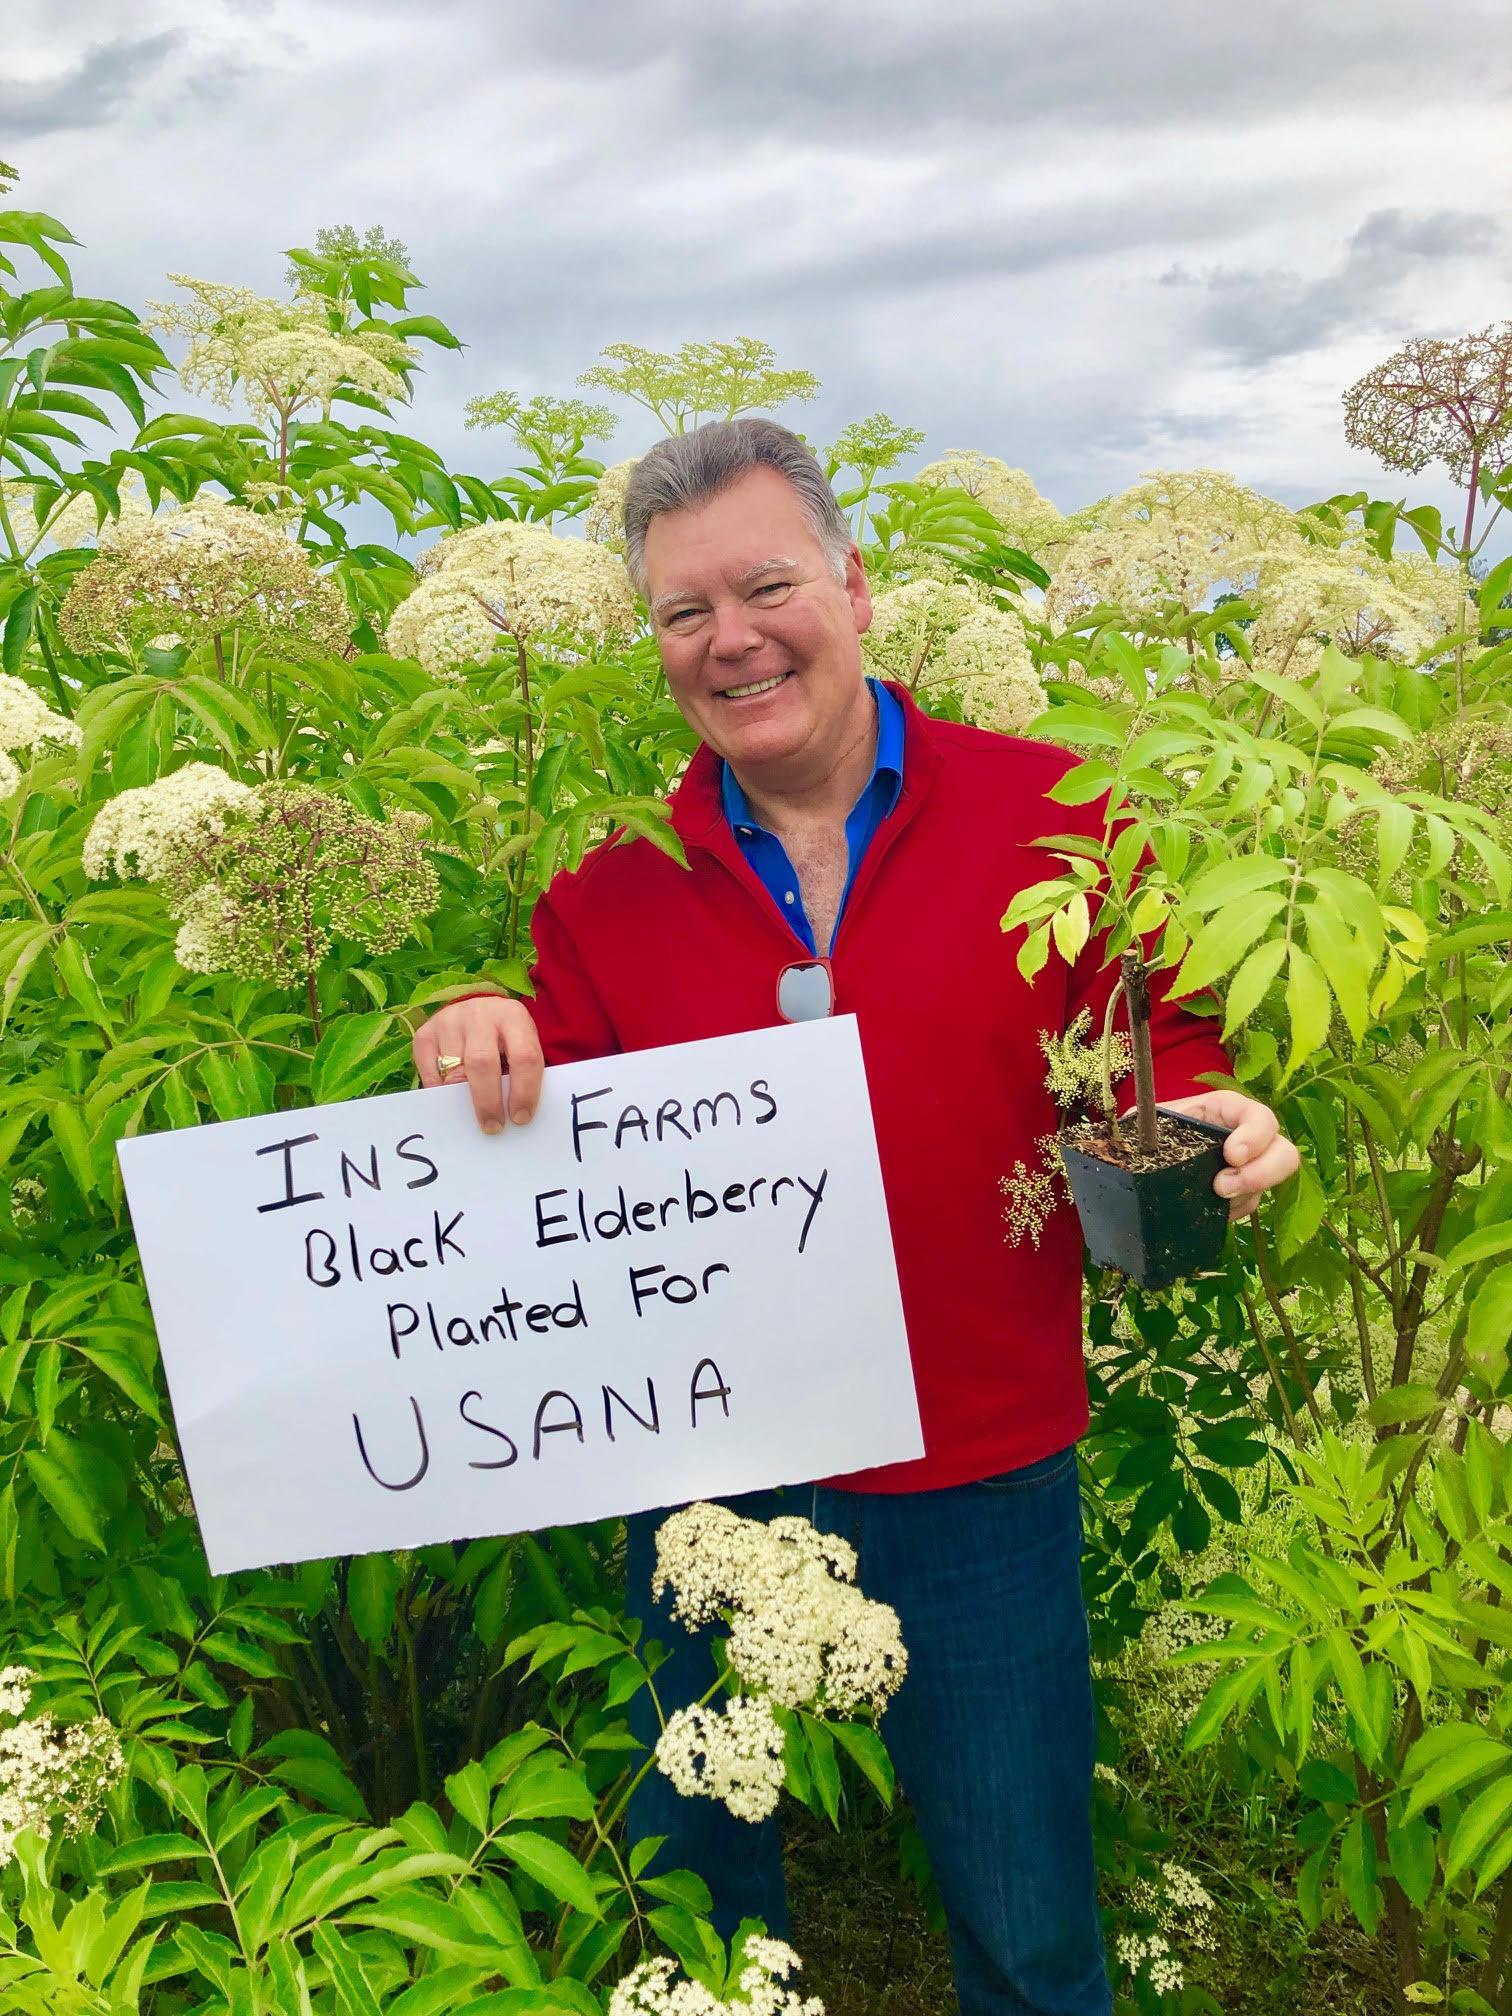 Plant-Elderberry-Usana.jpg